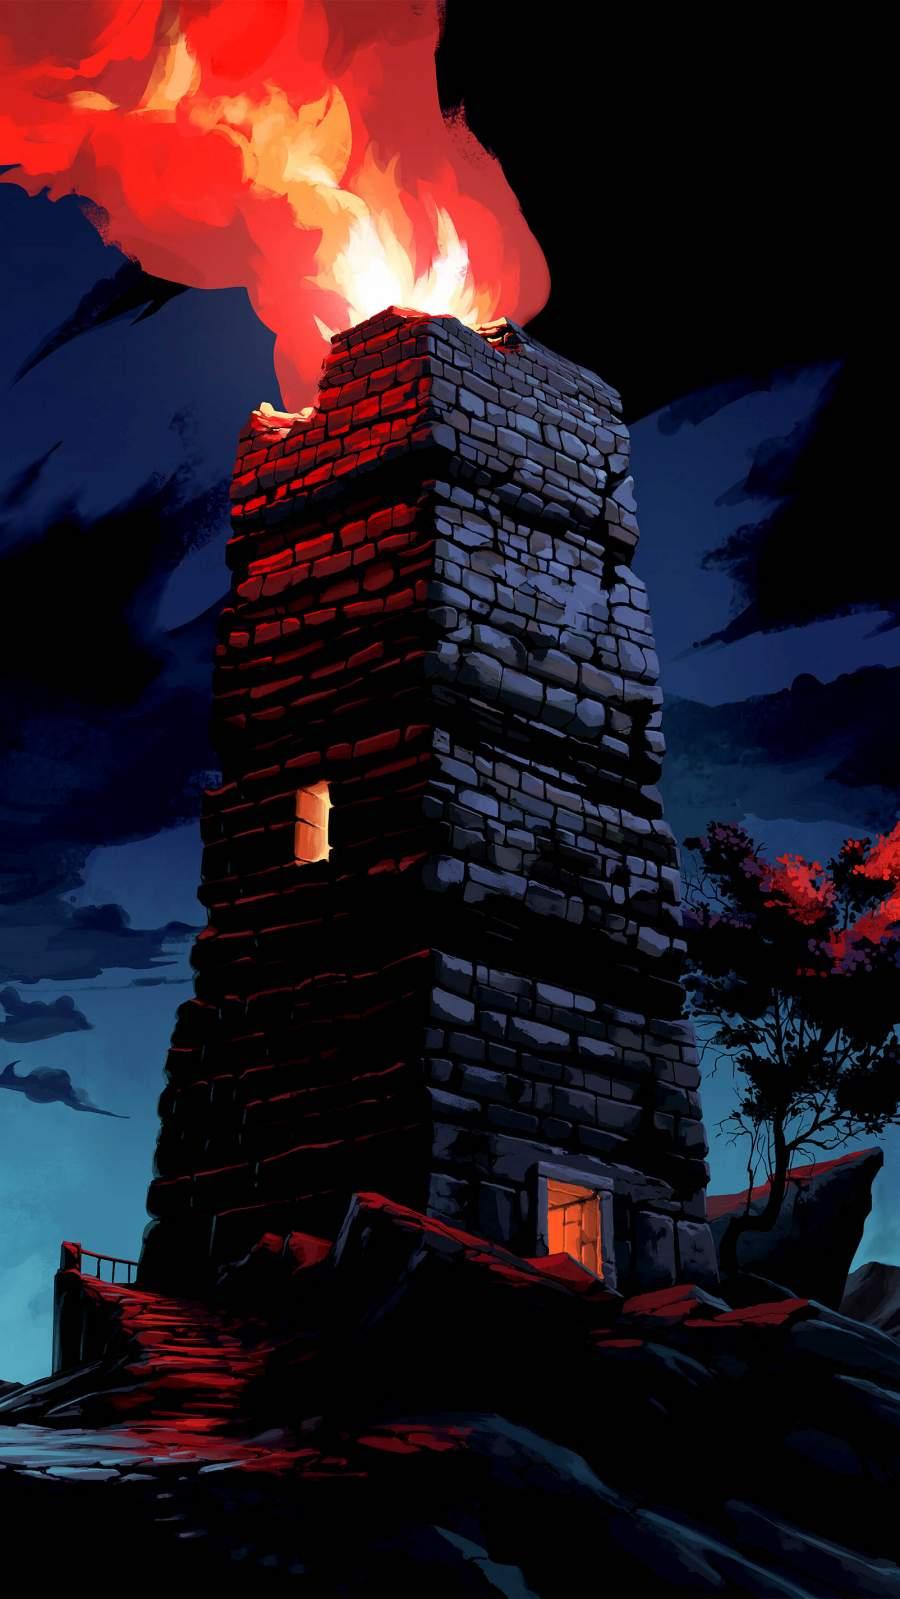 Fire Tower iPhone Wallpaper